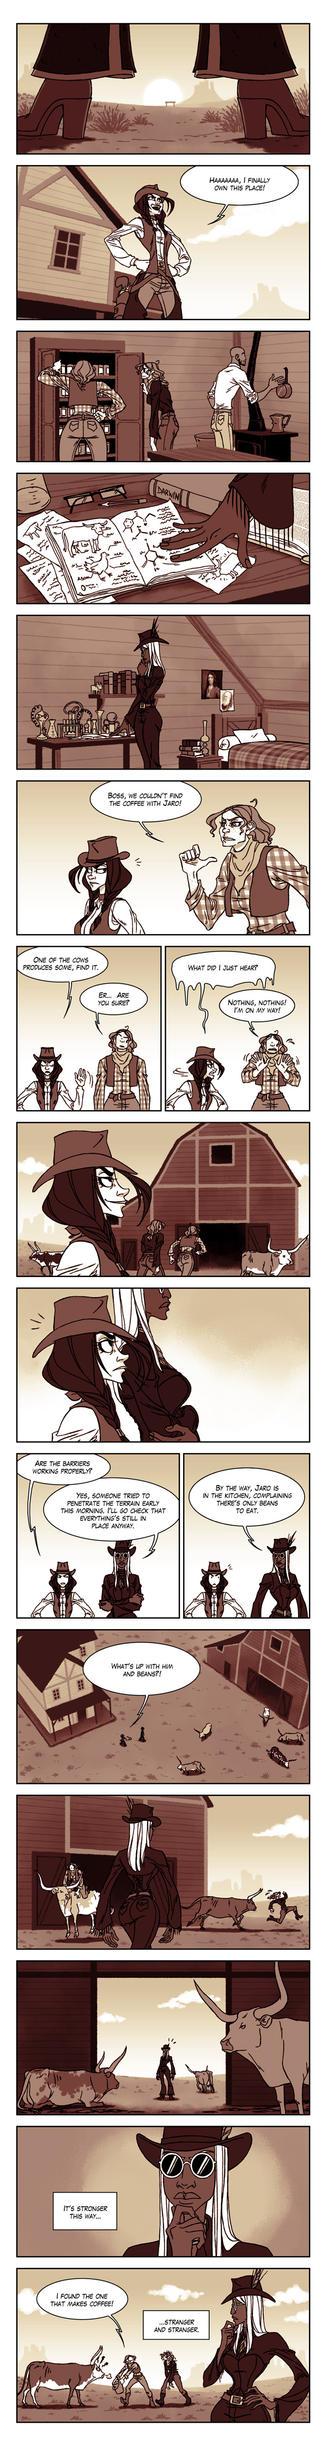 Jo strip 29 by JackPot-84